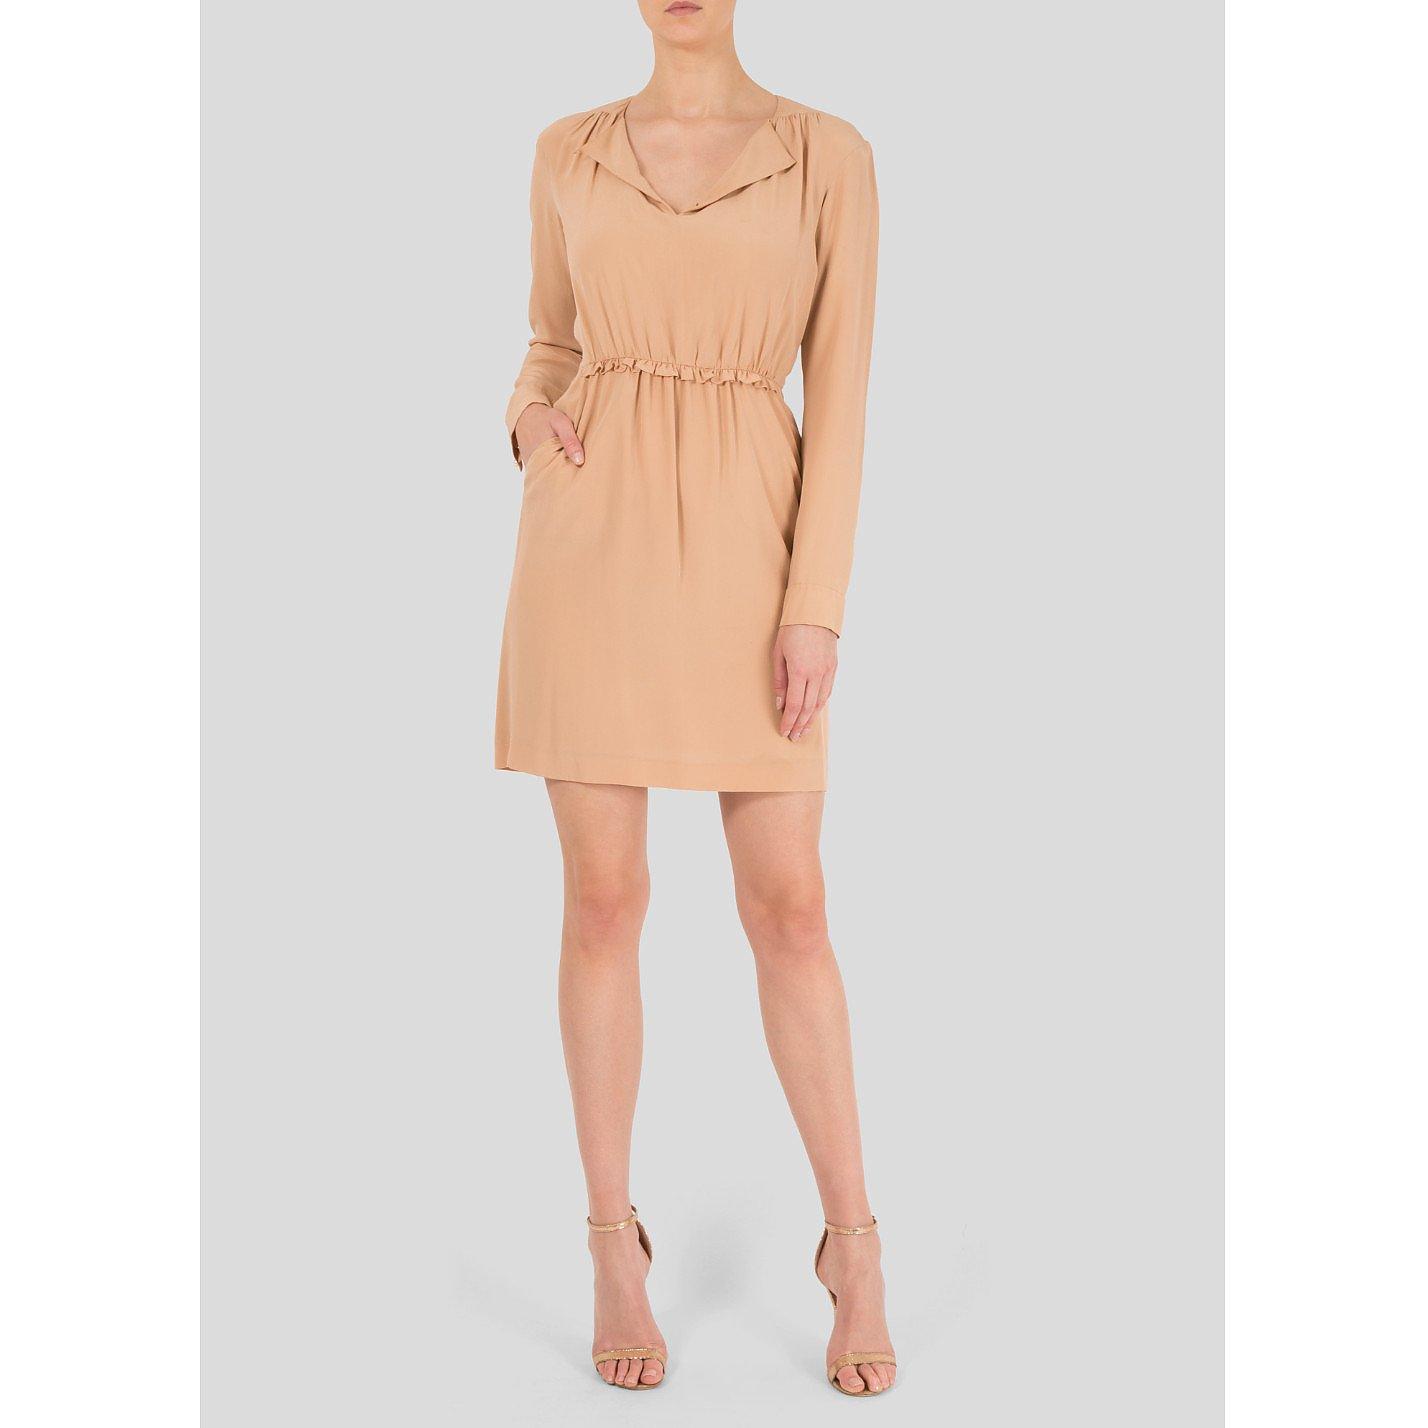 Chloé Long Sleeved Frill-Trimmed Silk Dress